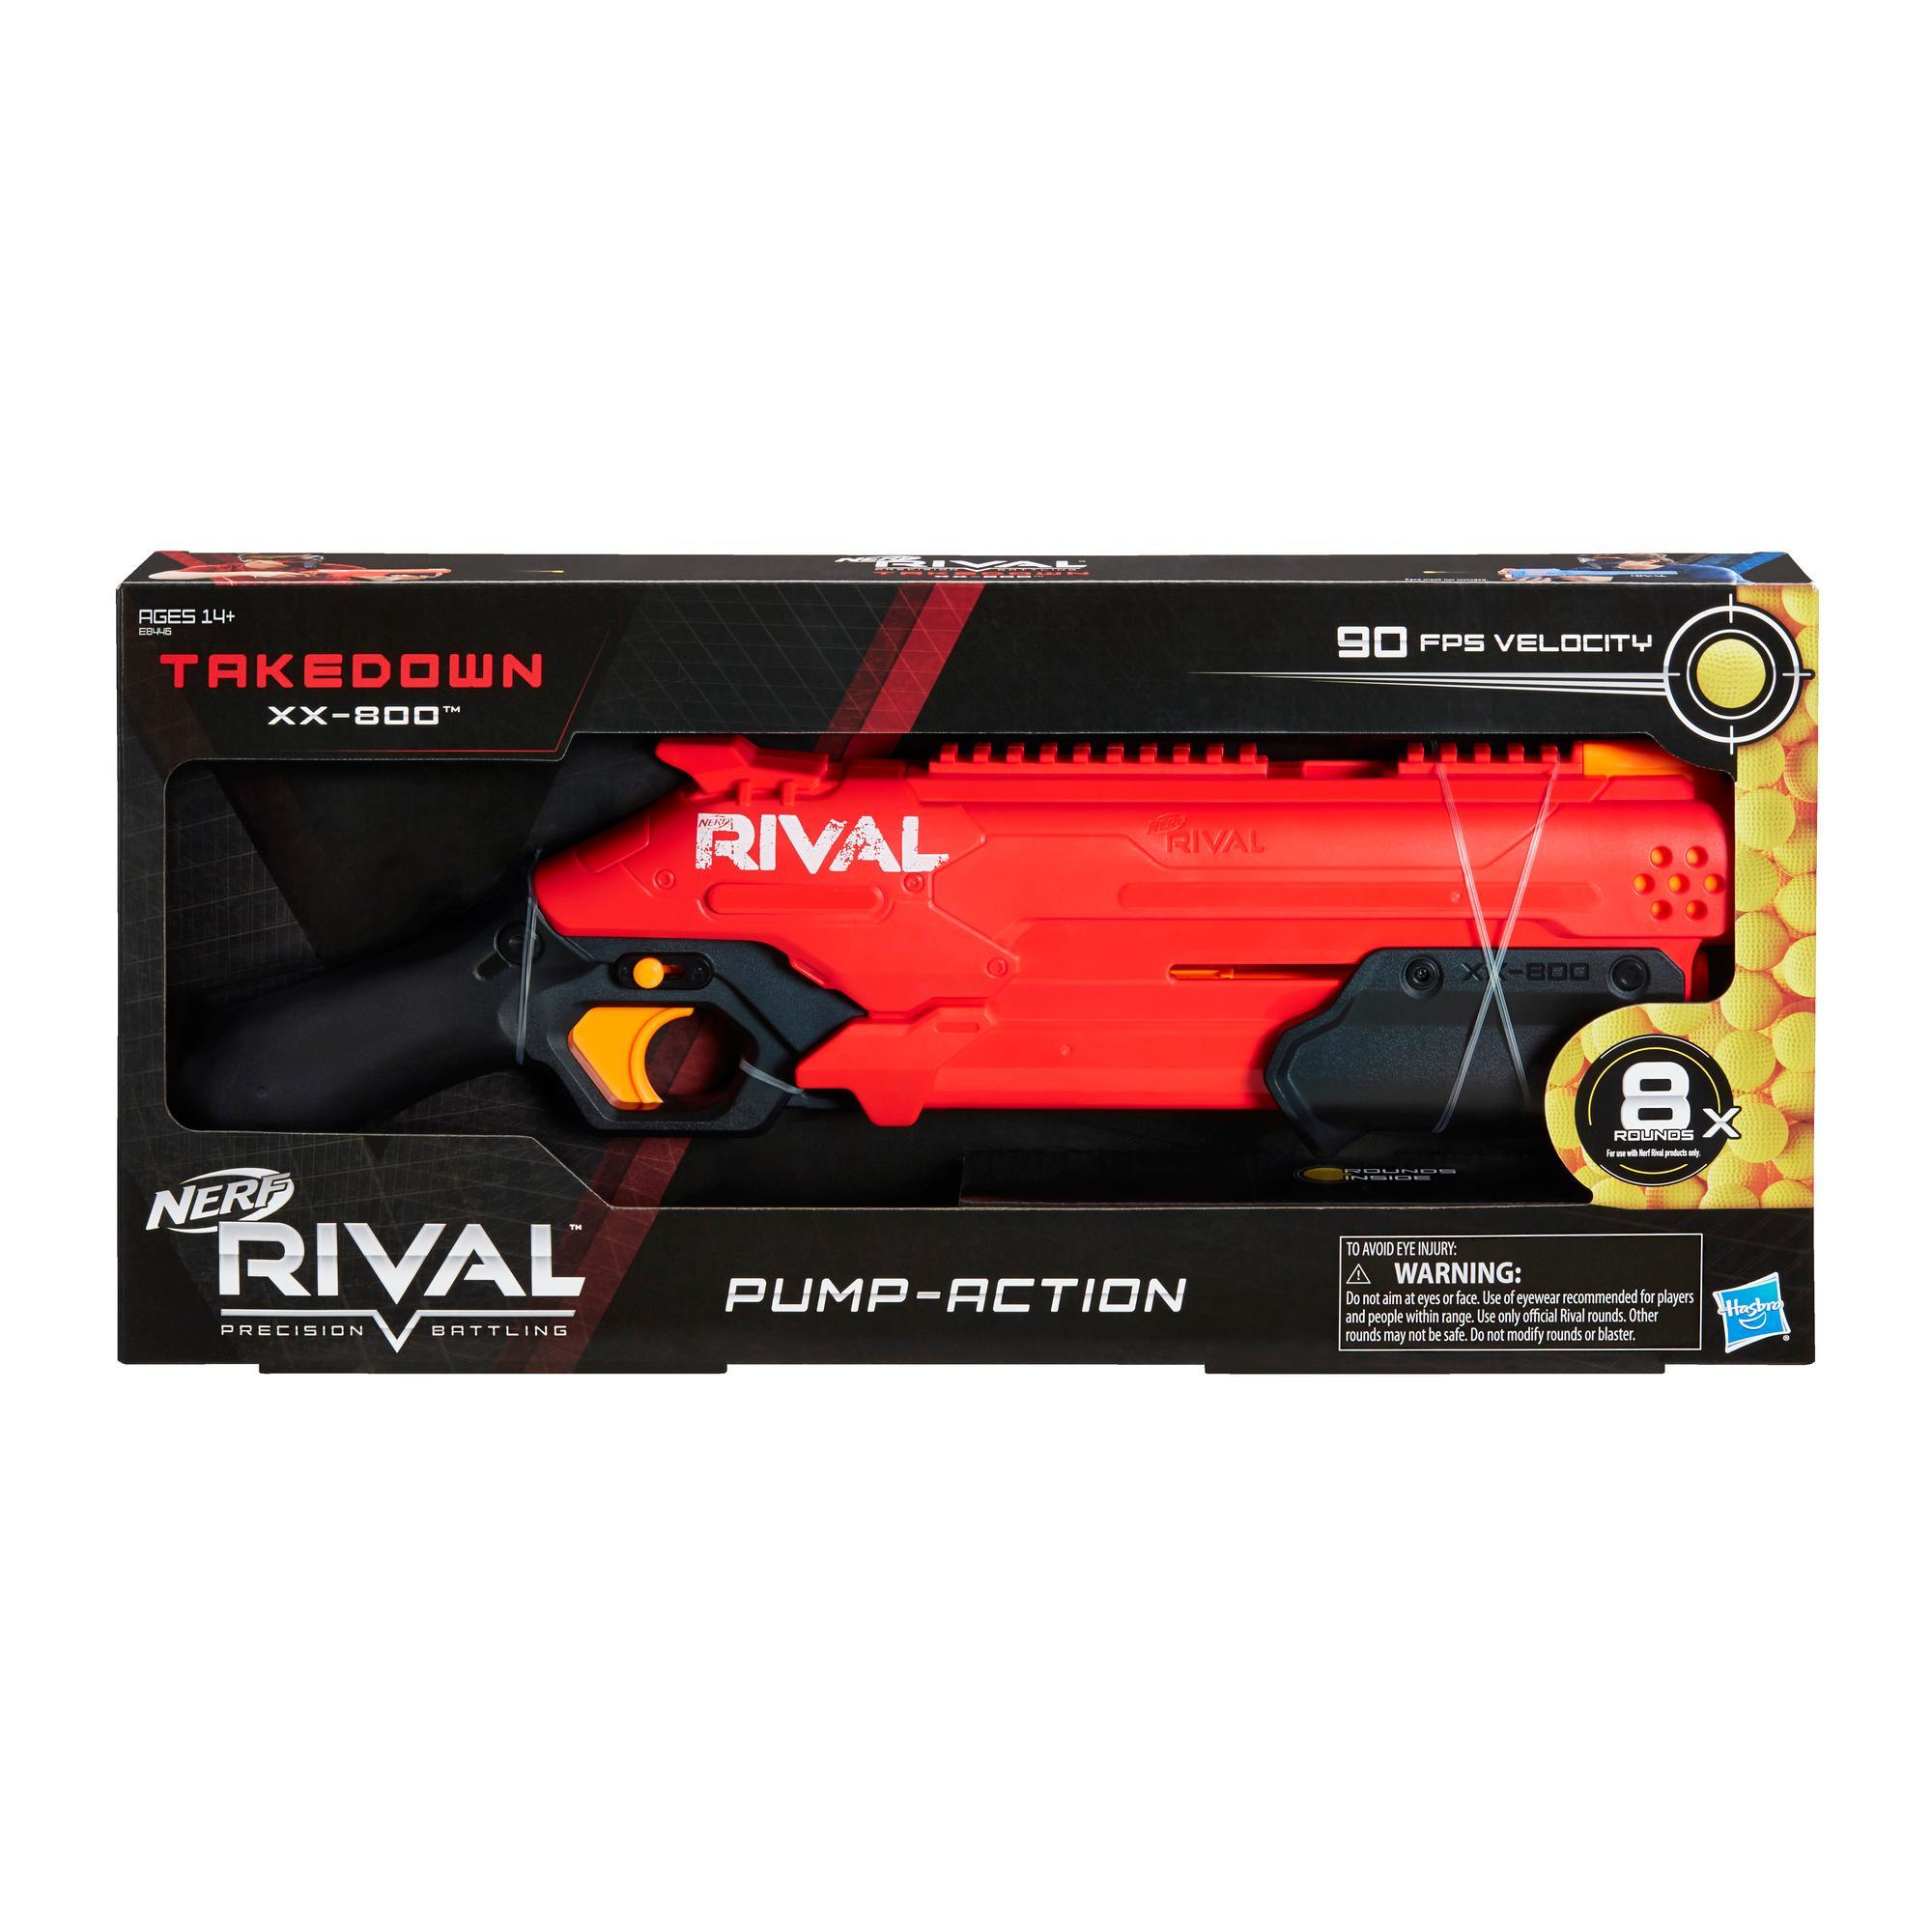 Lançador Nerf Rival Takedown XX-800 -- Bombeador, câmara de recarga, capacidade para 8 projéteis, 27 m/s, 8 projéteis Nerf Rival, time vermelho